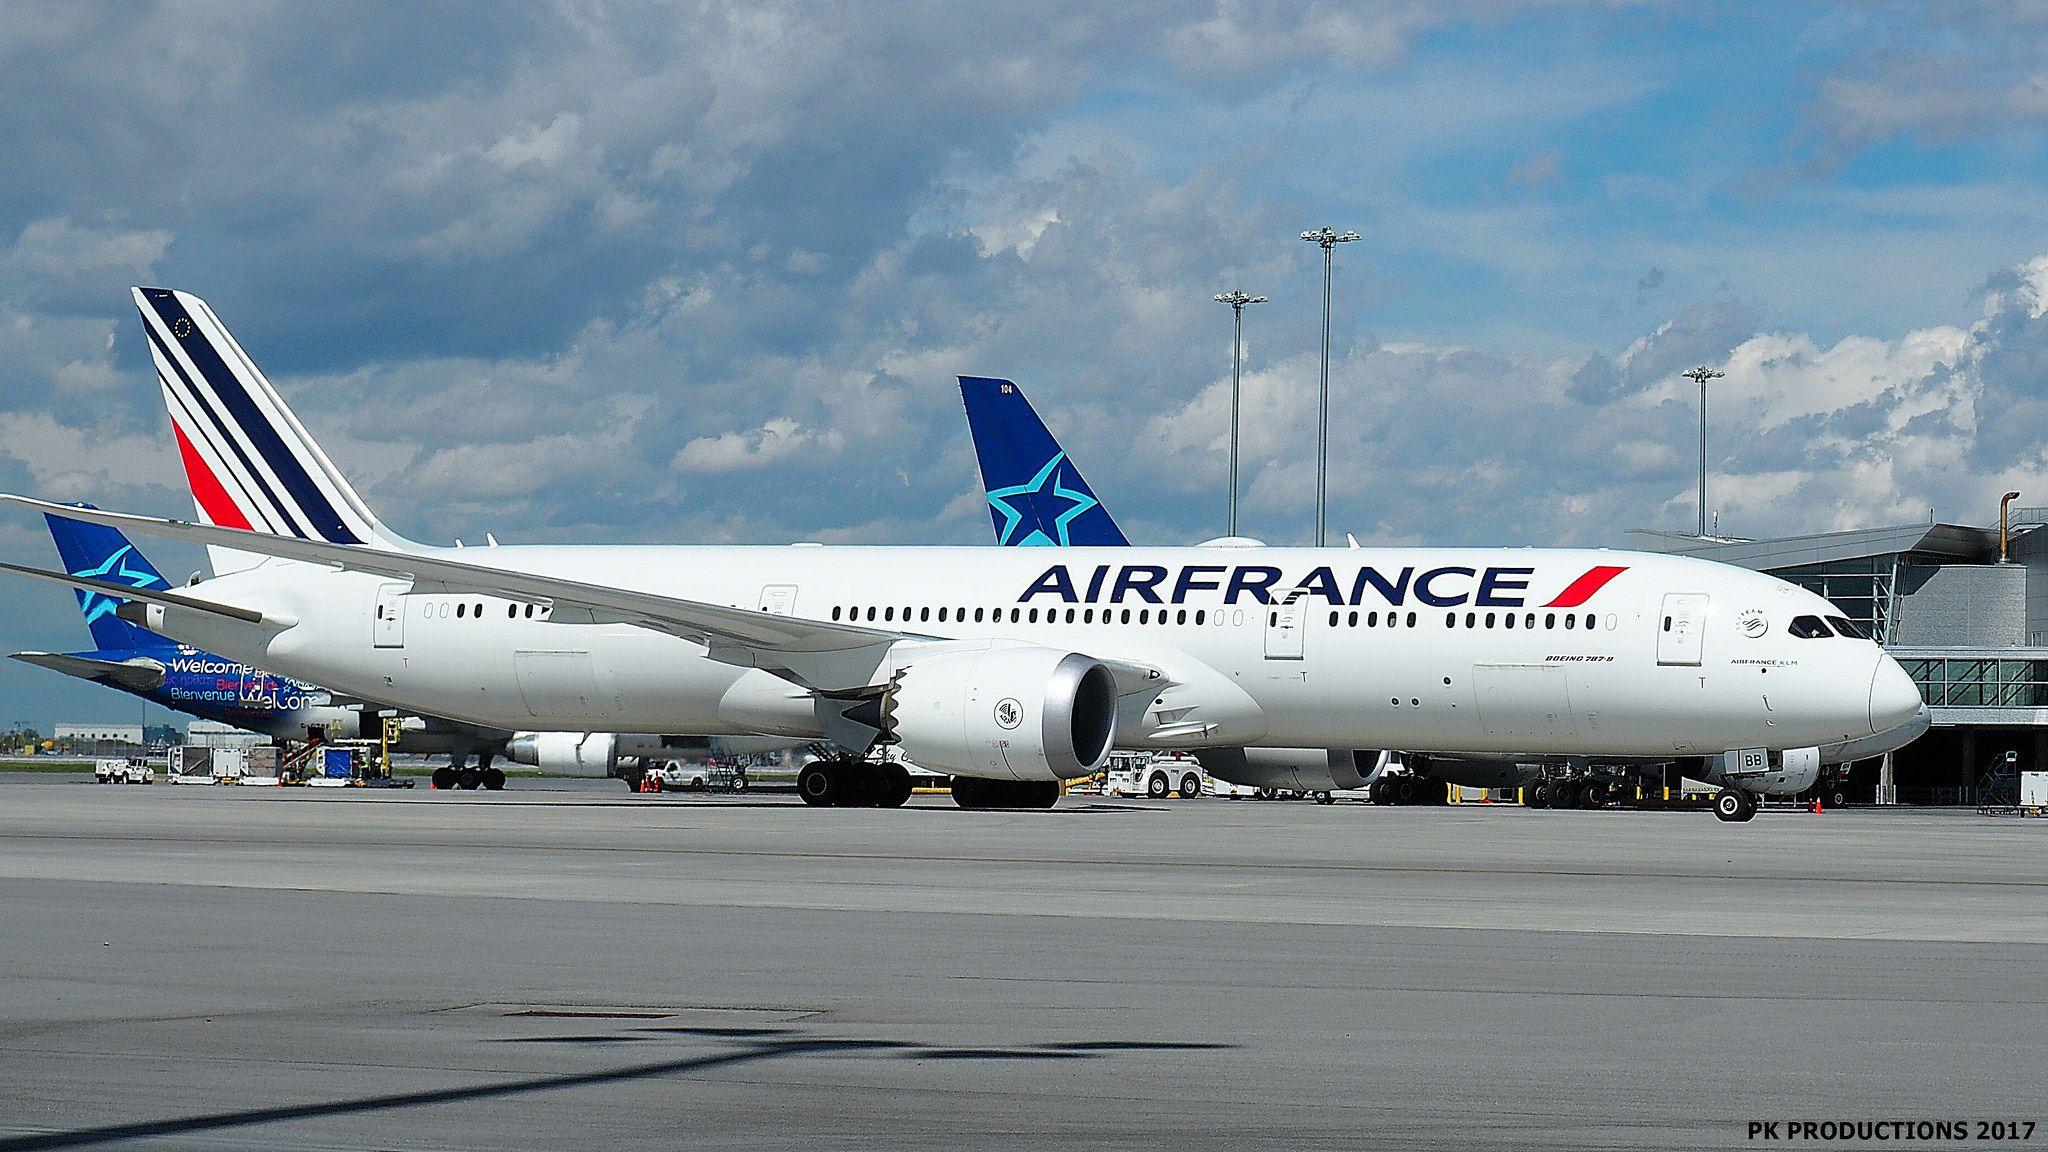 P7030300 TRUDEAU Air france, Boeing 787 dreamliner